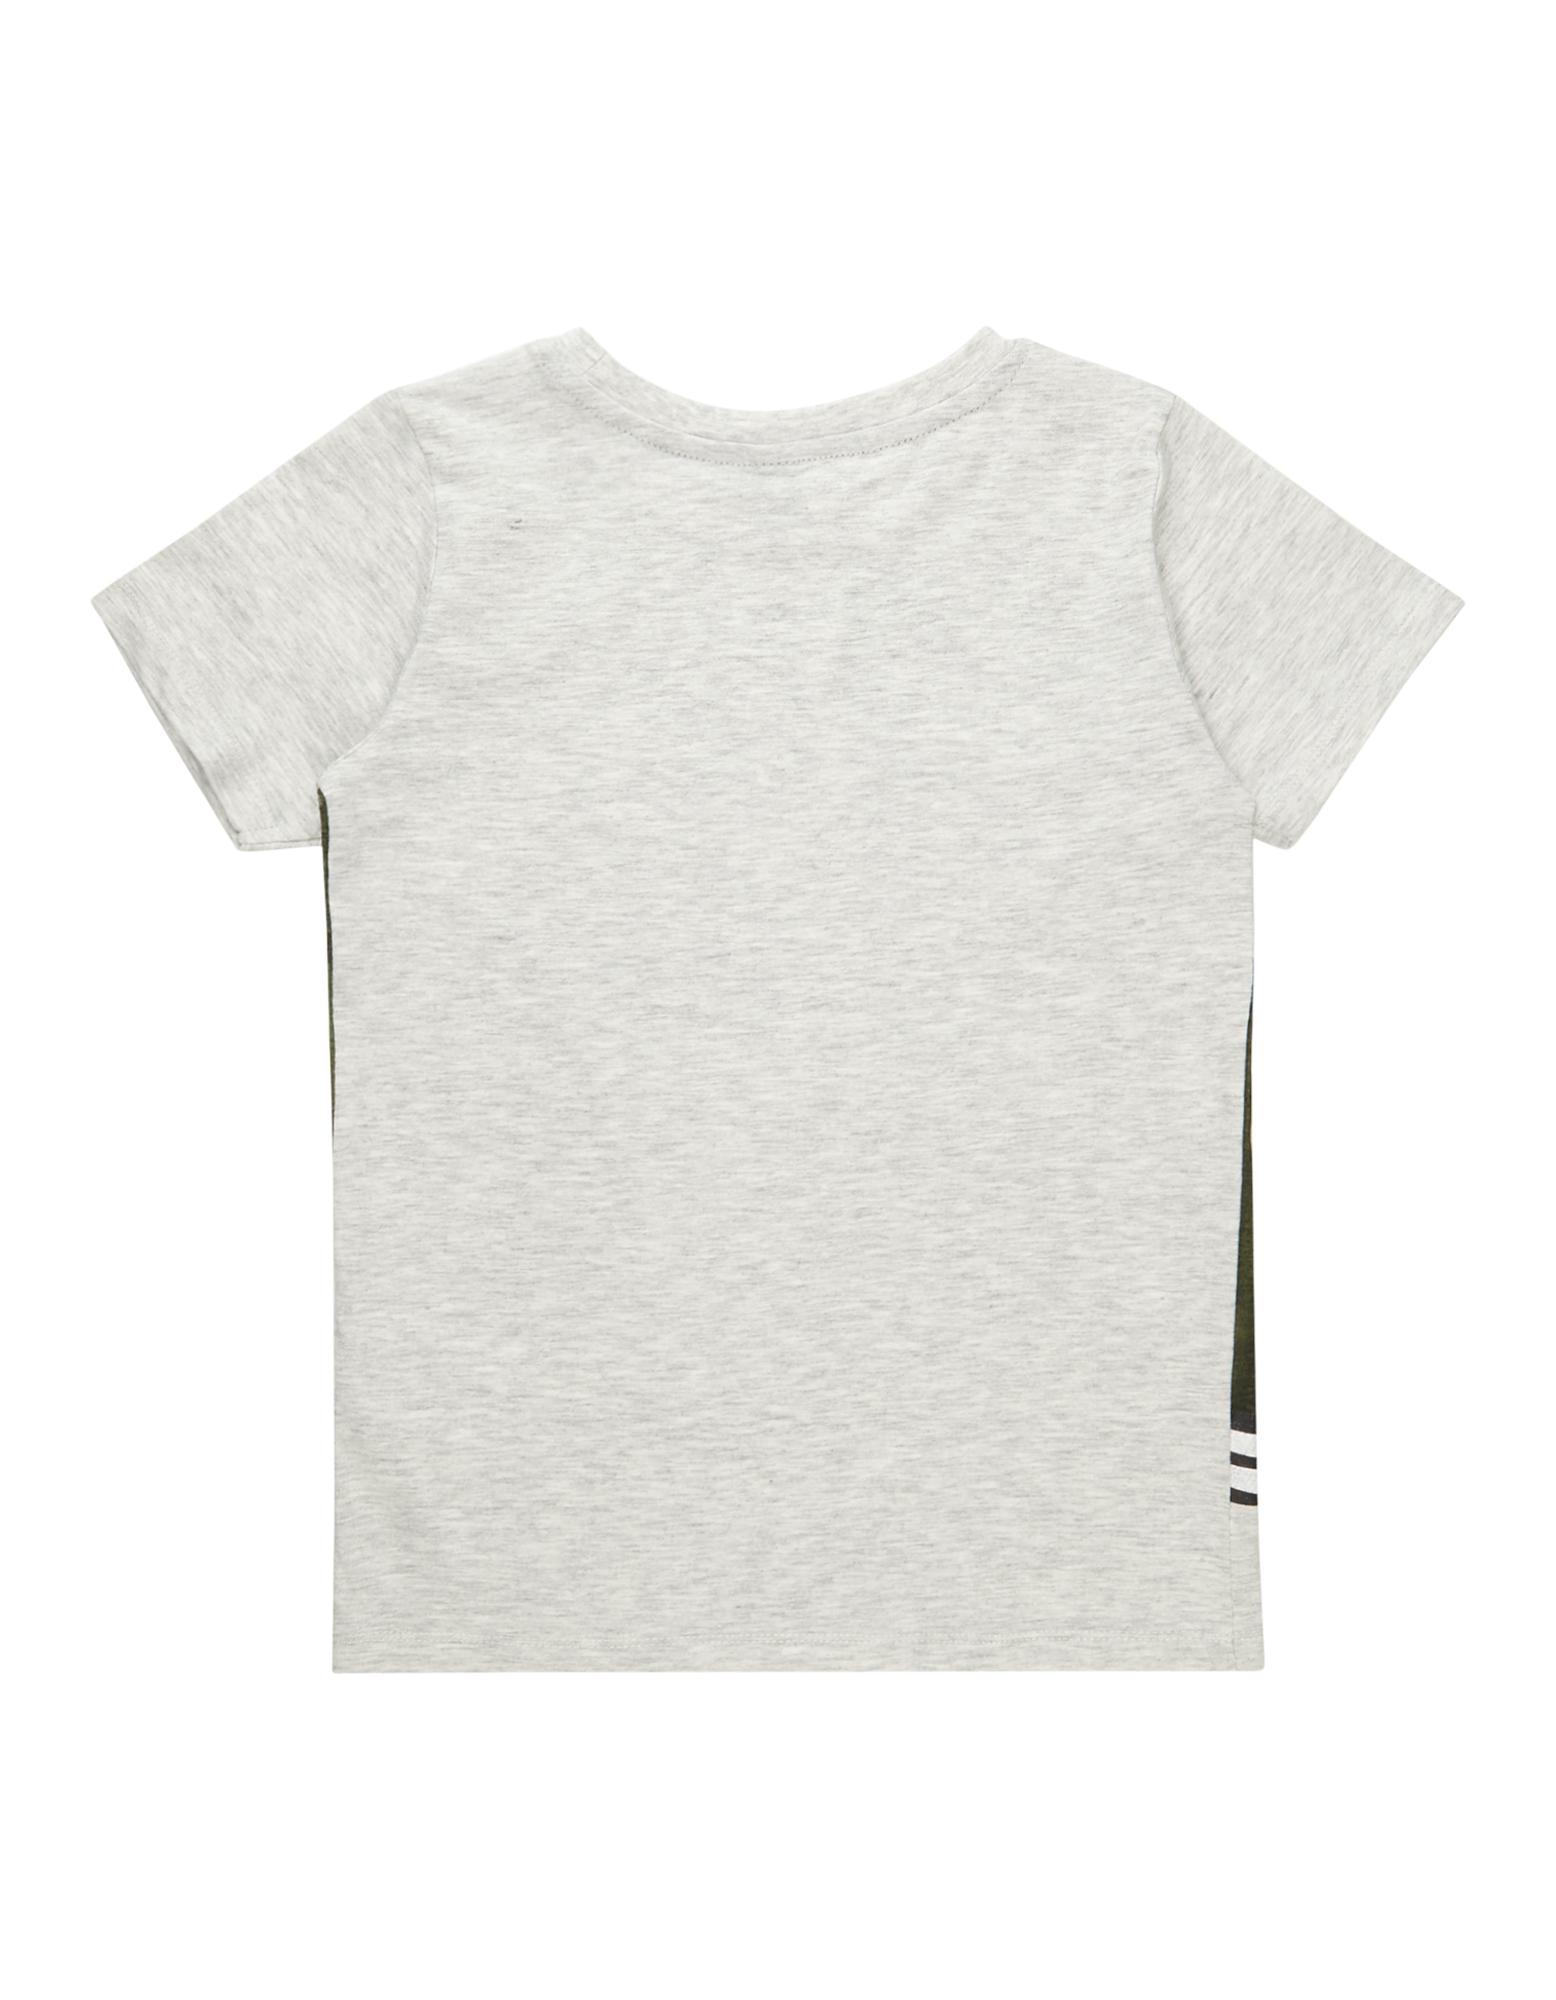 Beste T Shirt Rahmen Galerie - Rahmen Ideen - markjohnsonshow.info